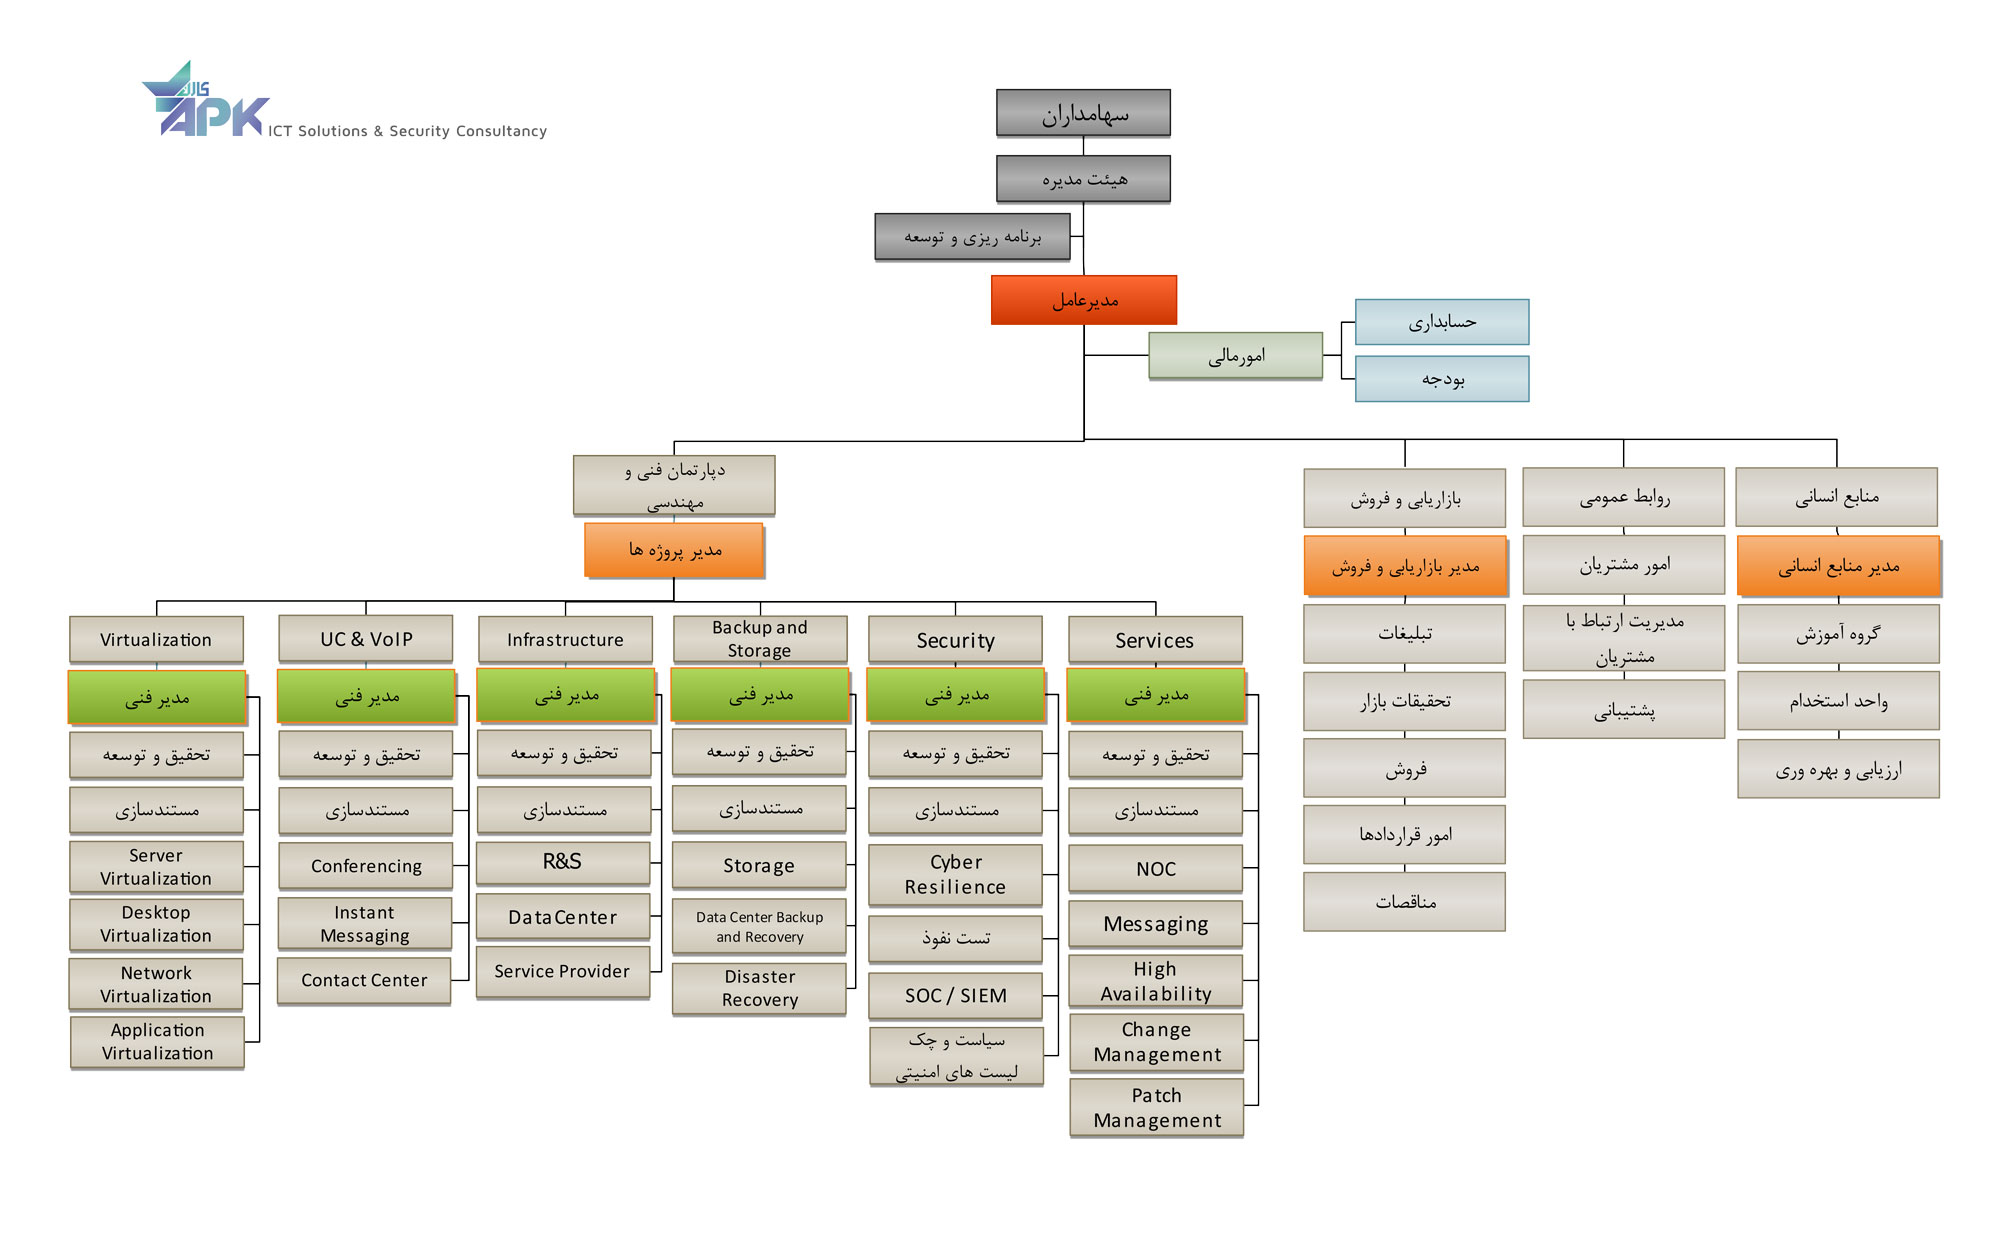 شرکت APK - چارت سازمانی